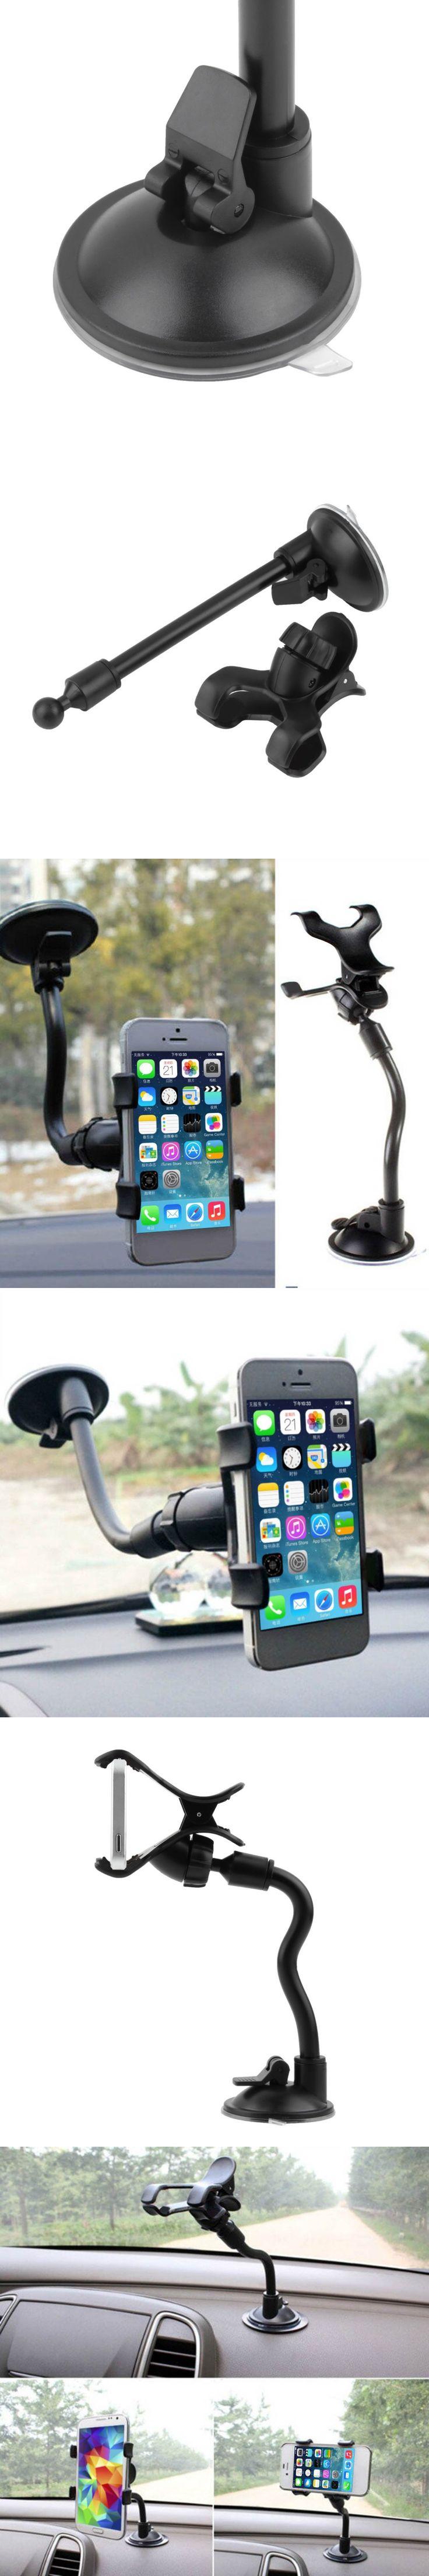 1pcs Hight Quality Car Mount Holder 360 Rotation Windshield Bracket for GPS Mobile Phone Wholesale#